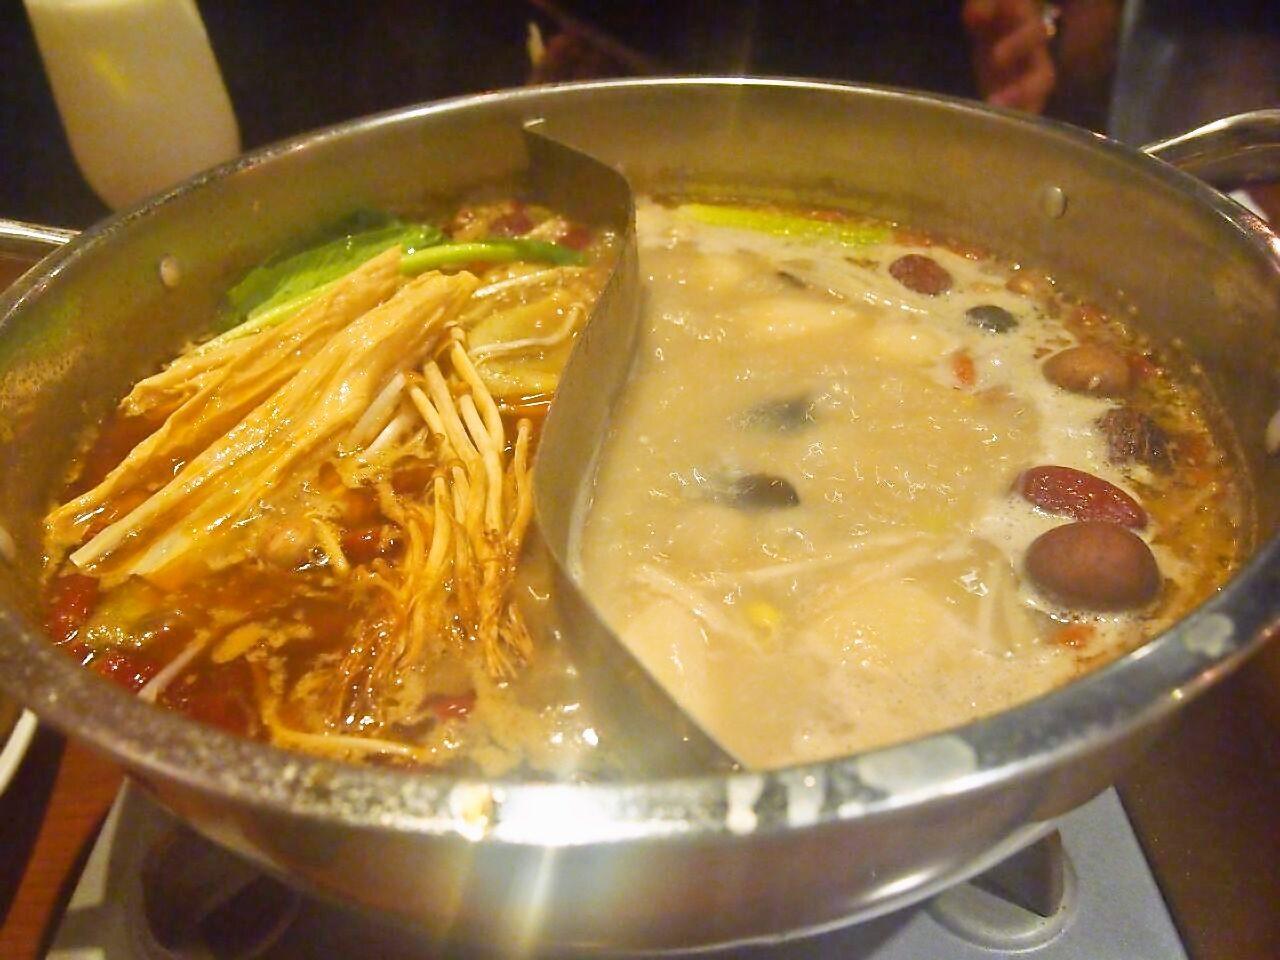 s-foodpic7833332.jpg